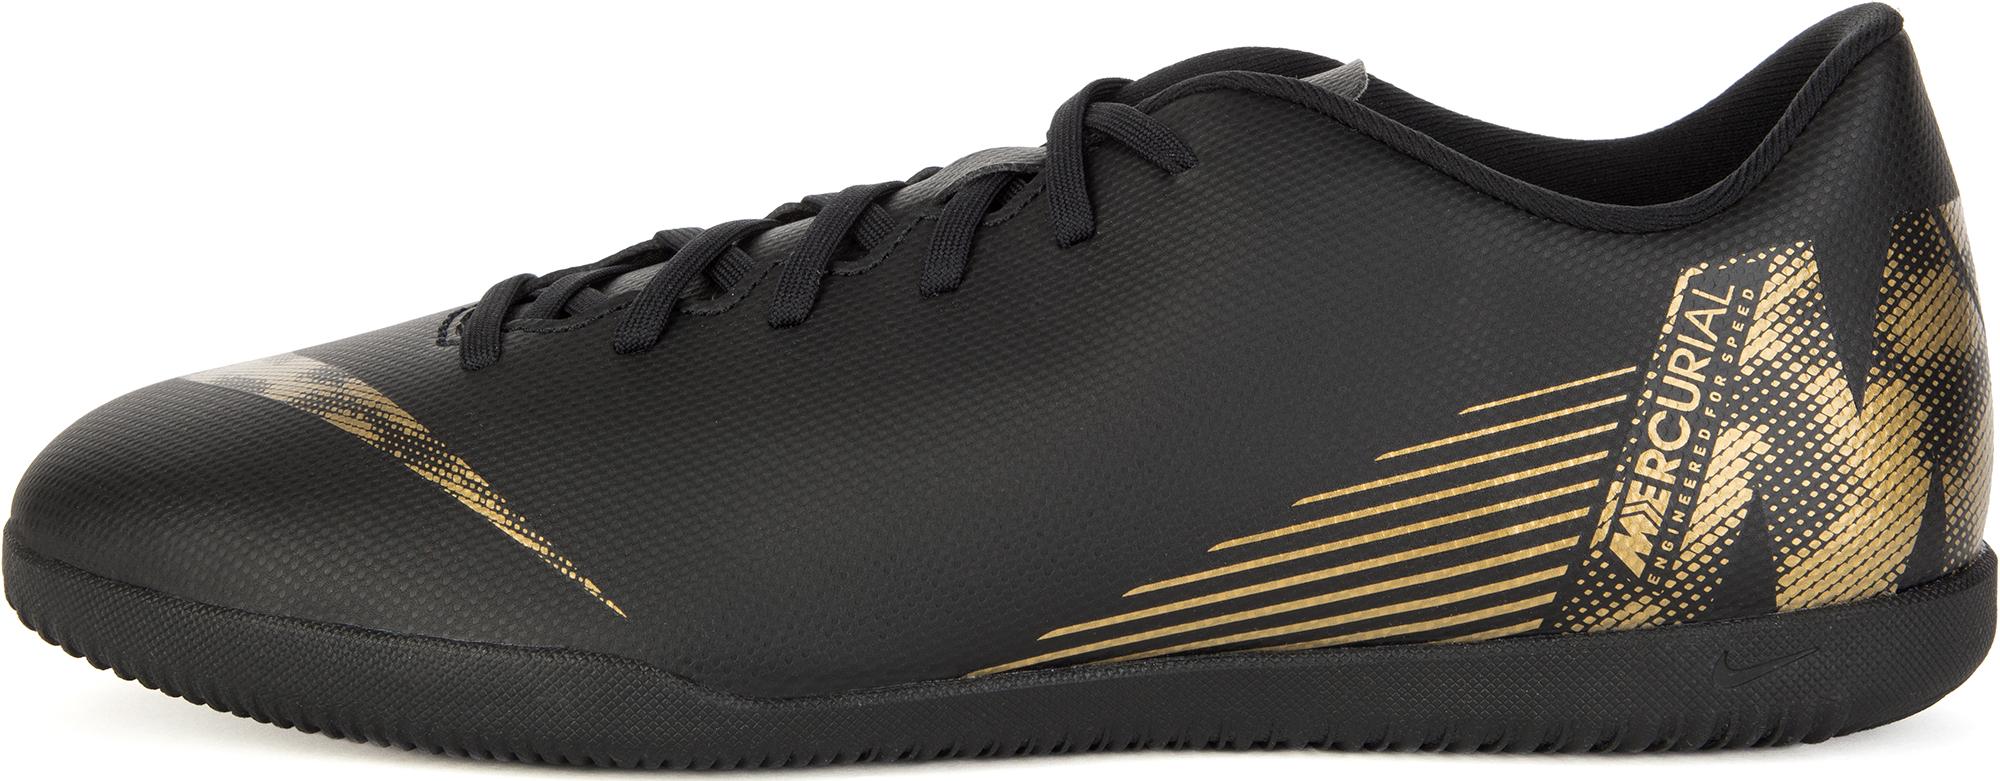 Nike Бутсы мужские Nike Mercurial VaporX 12 Club IC, размер 45 цена